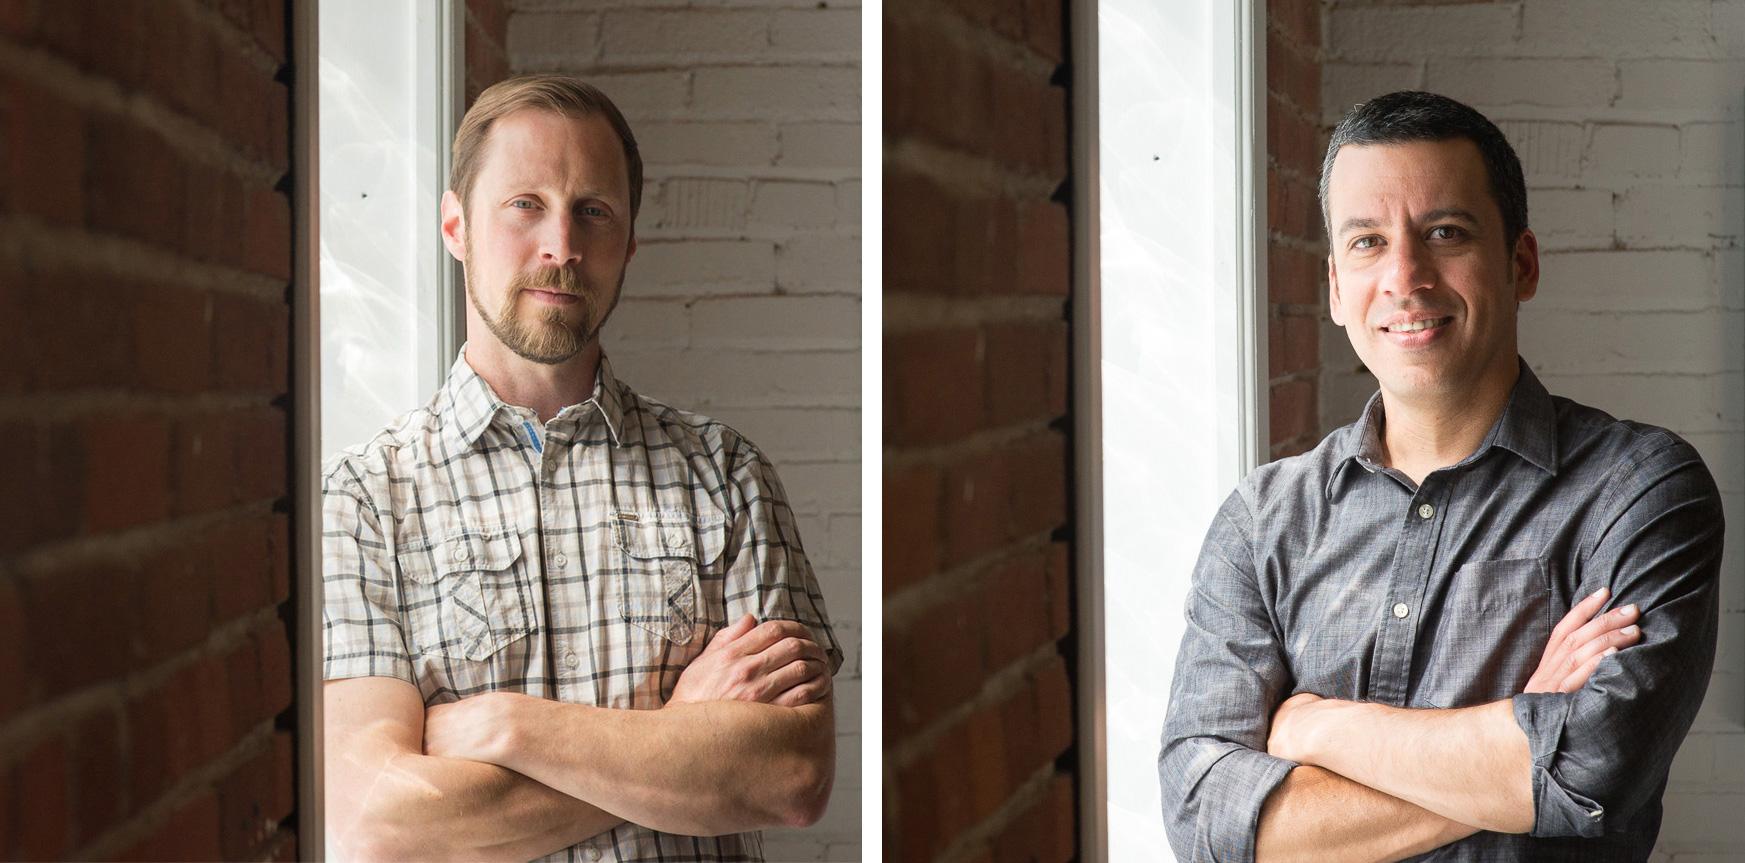 Ryan Jorgensen (left) and Daniel Nobre (right), principals at The Rapid Eye Movement